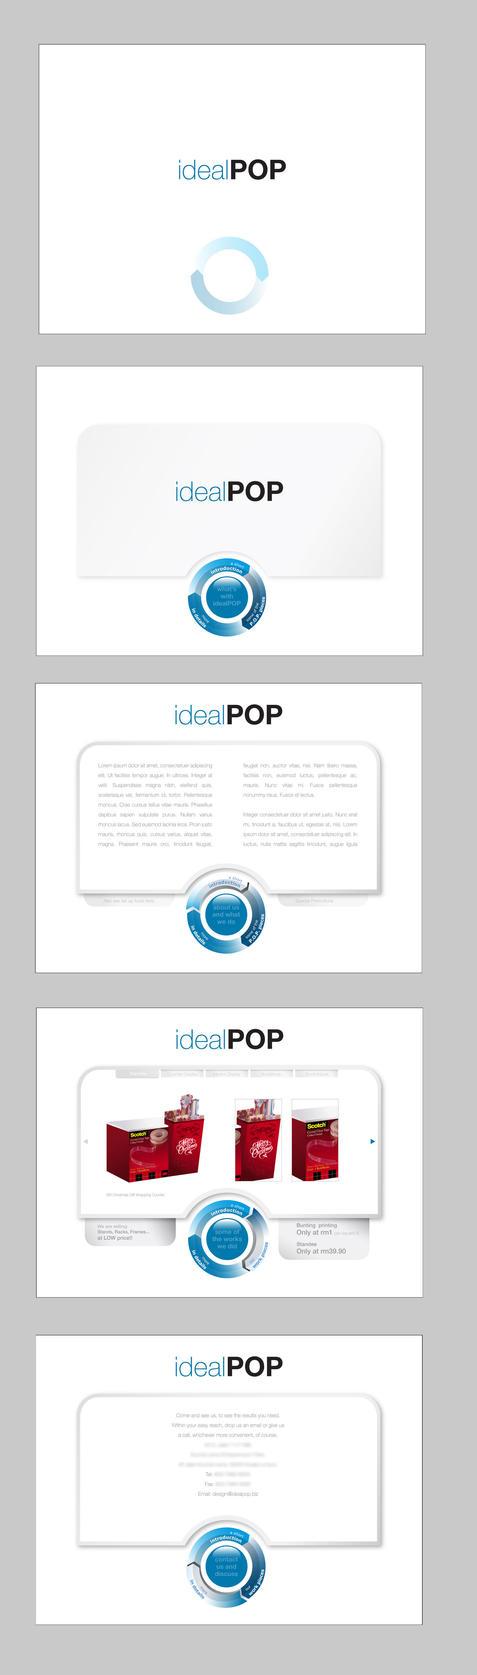 Web Design Client Meetingquestions